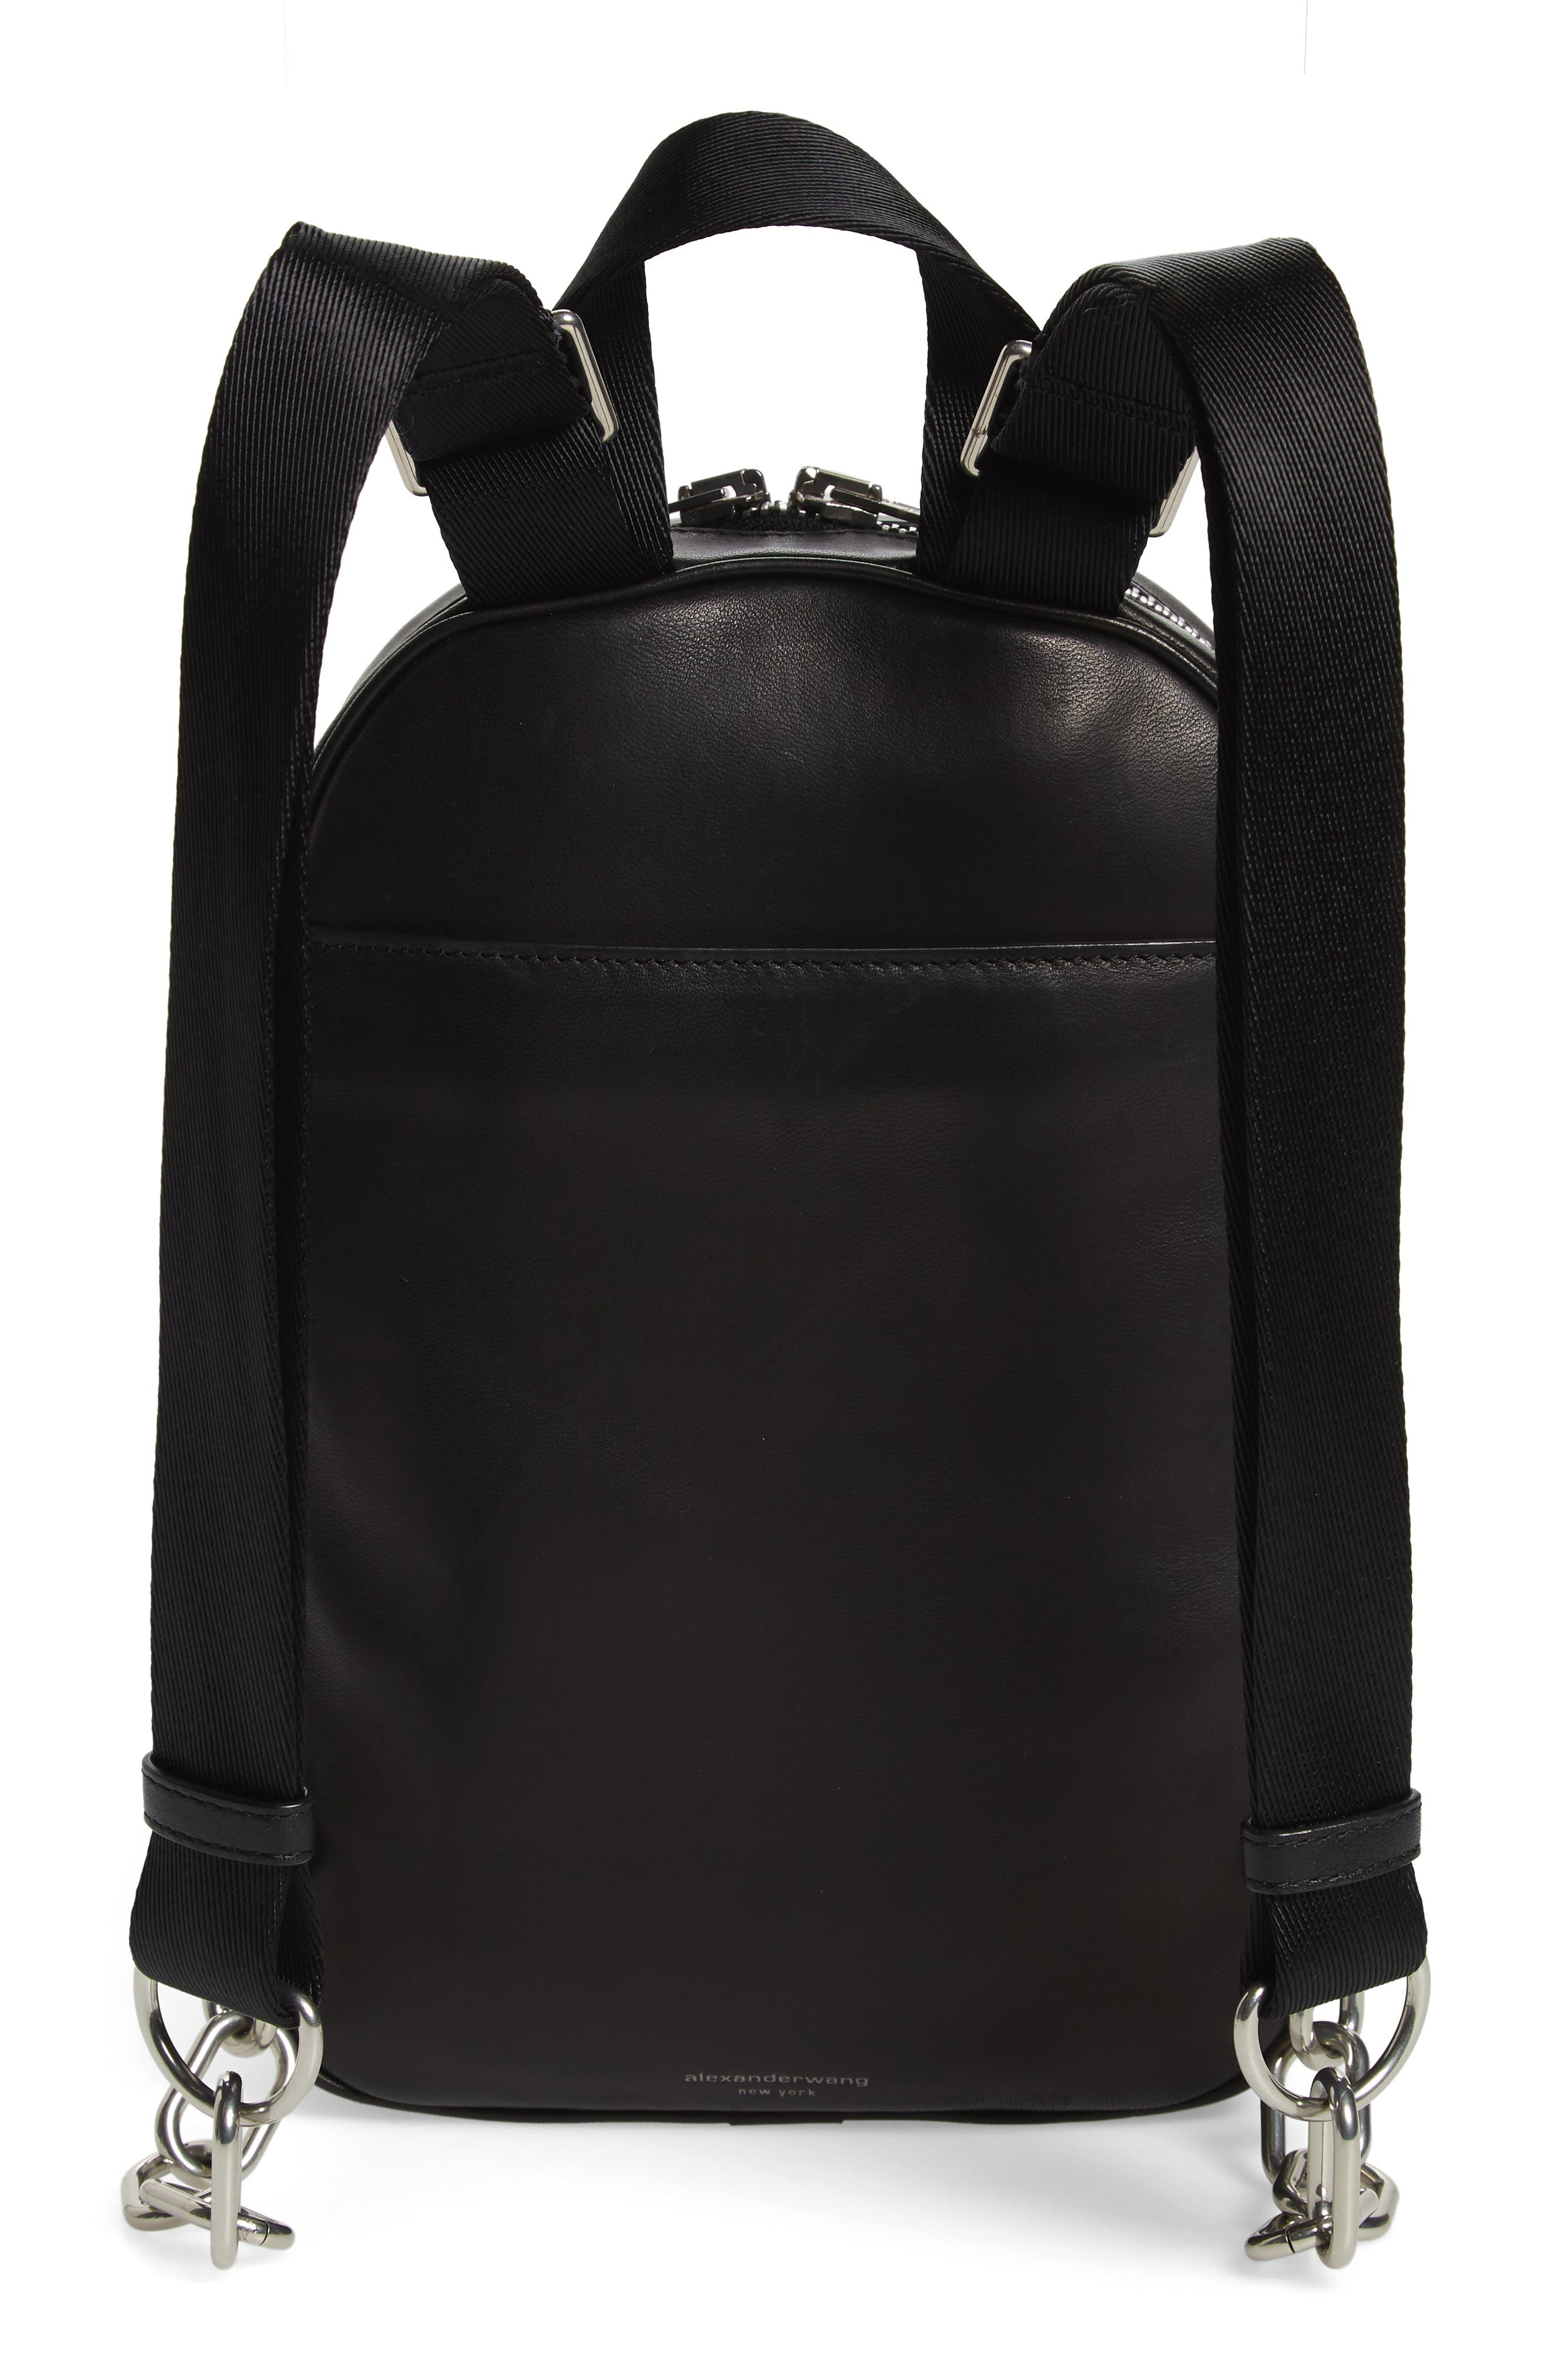 ALEXANDER WANG, Attica Lambskin Leather Backpack, Alternate thumbnail 3, color, BLACK